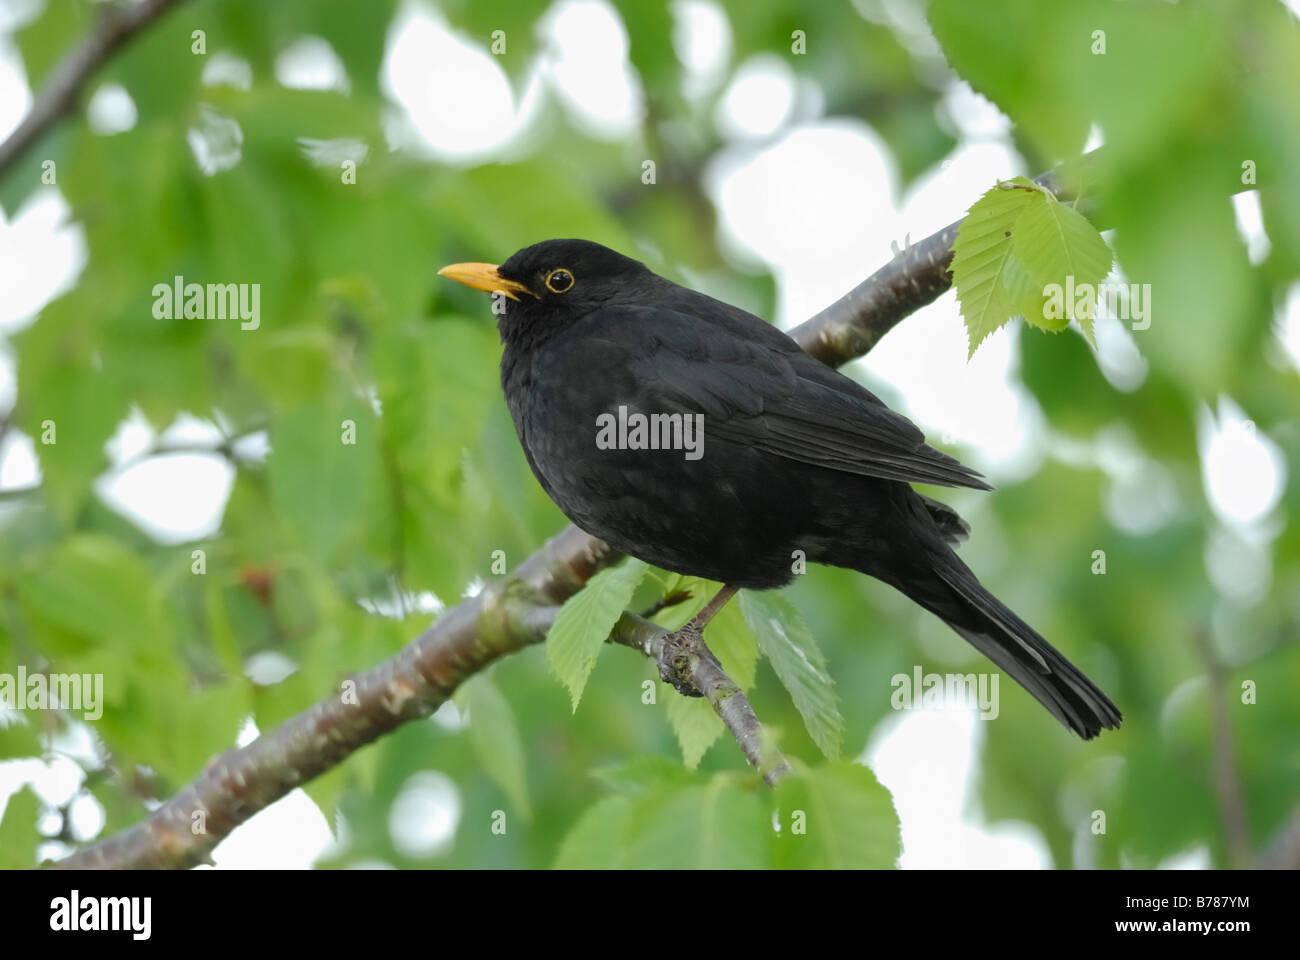 A Male Blackbird (Turdus merula) - Stock Image